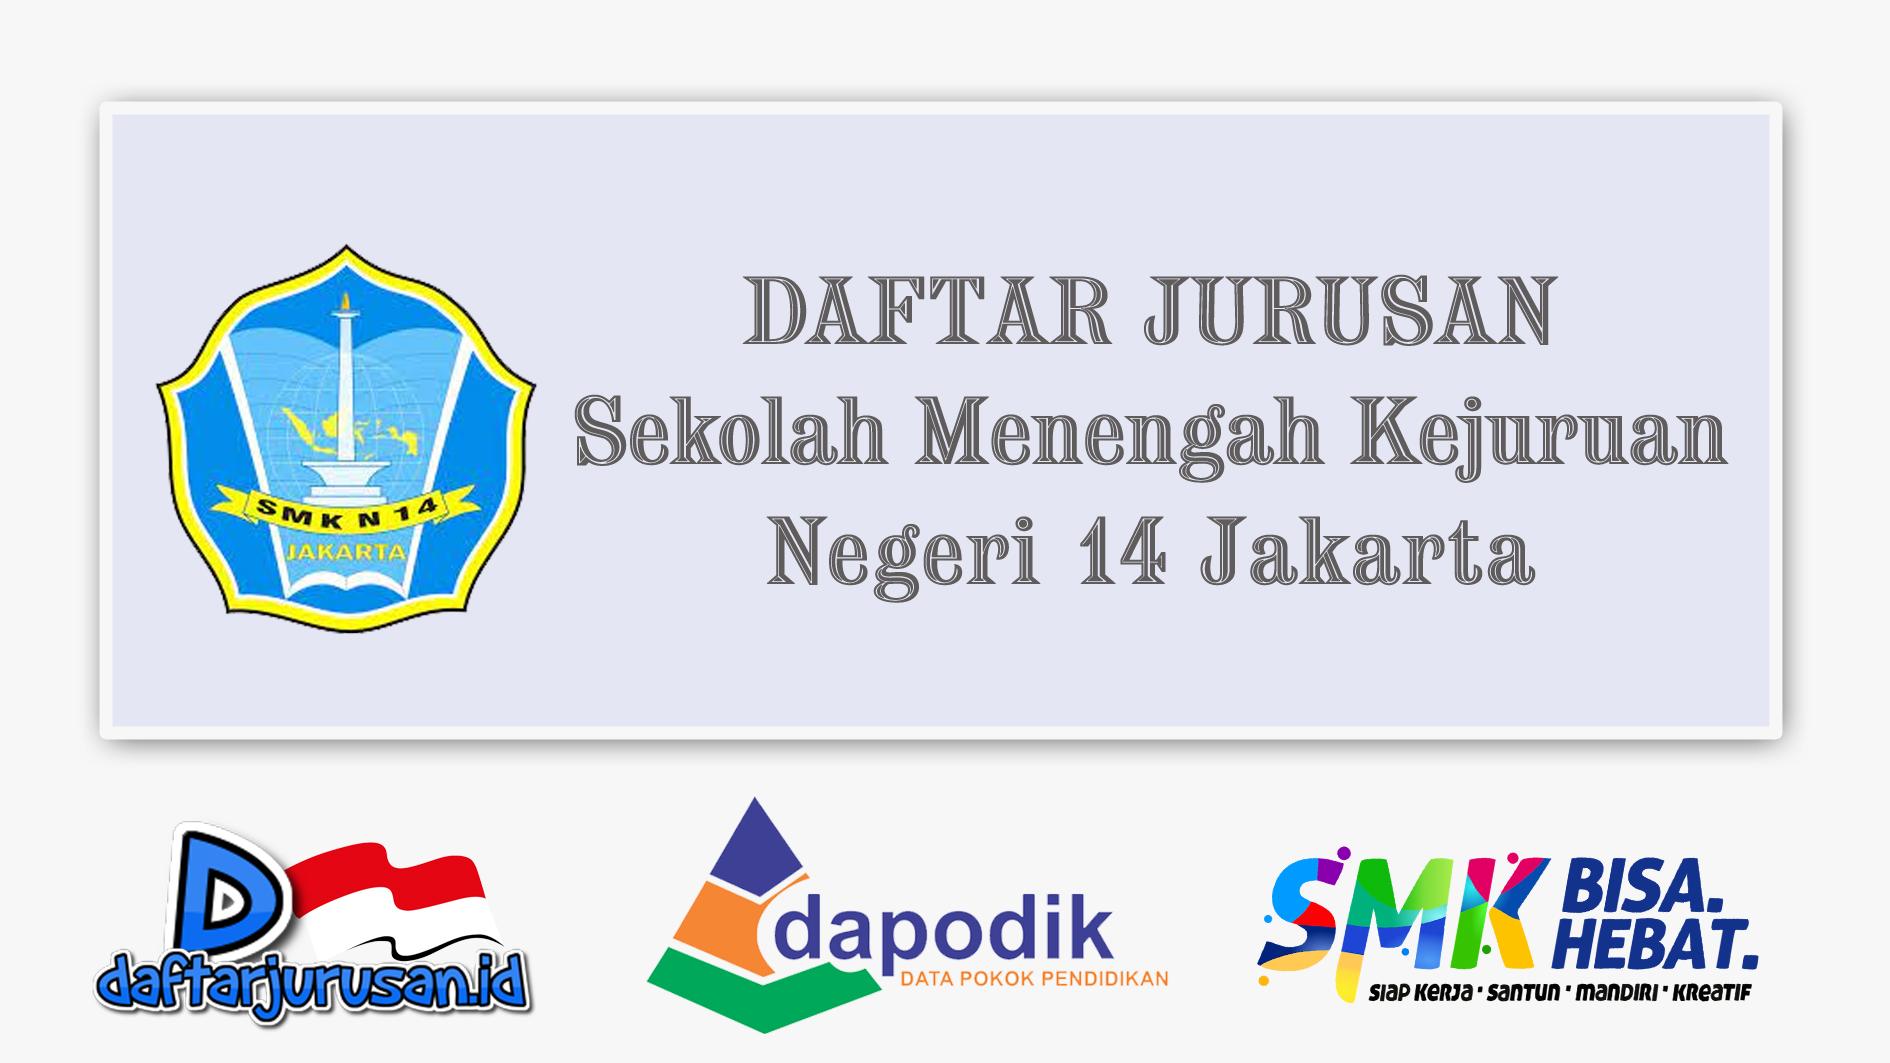 Daftar Jurusan SMK Negeri 14 Jakarta Pusat